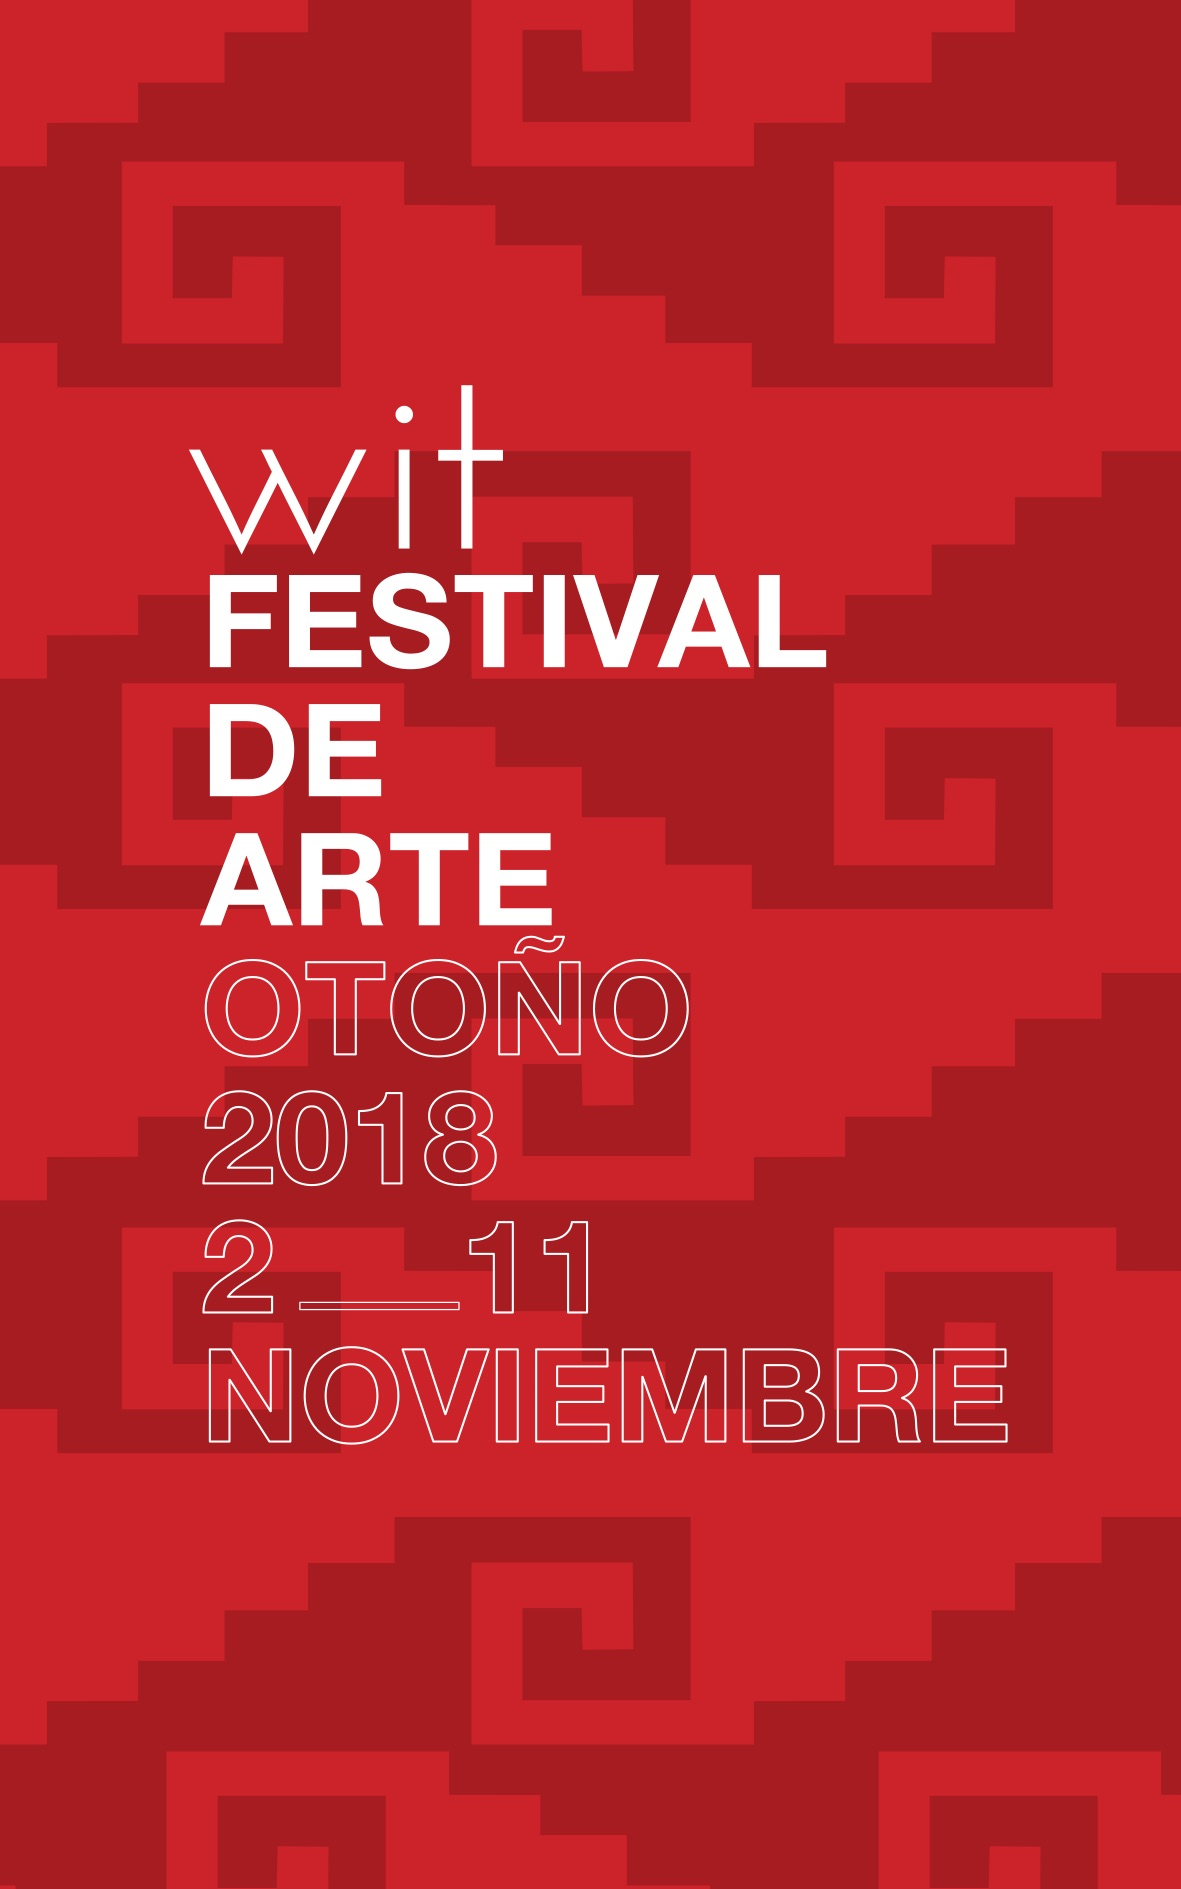 WIT Festival de Arte, 2 al 11 de Noviembre en Hotel Demetria